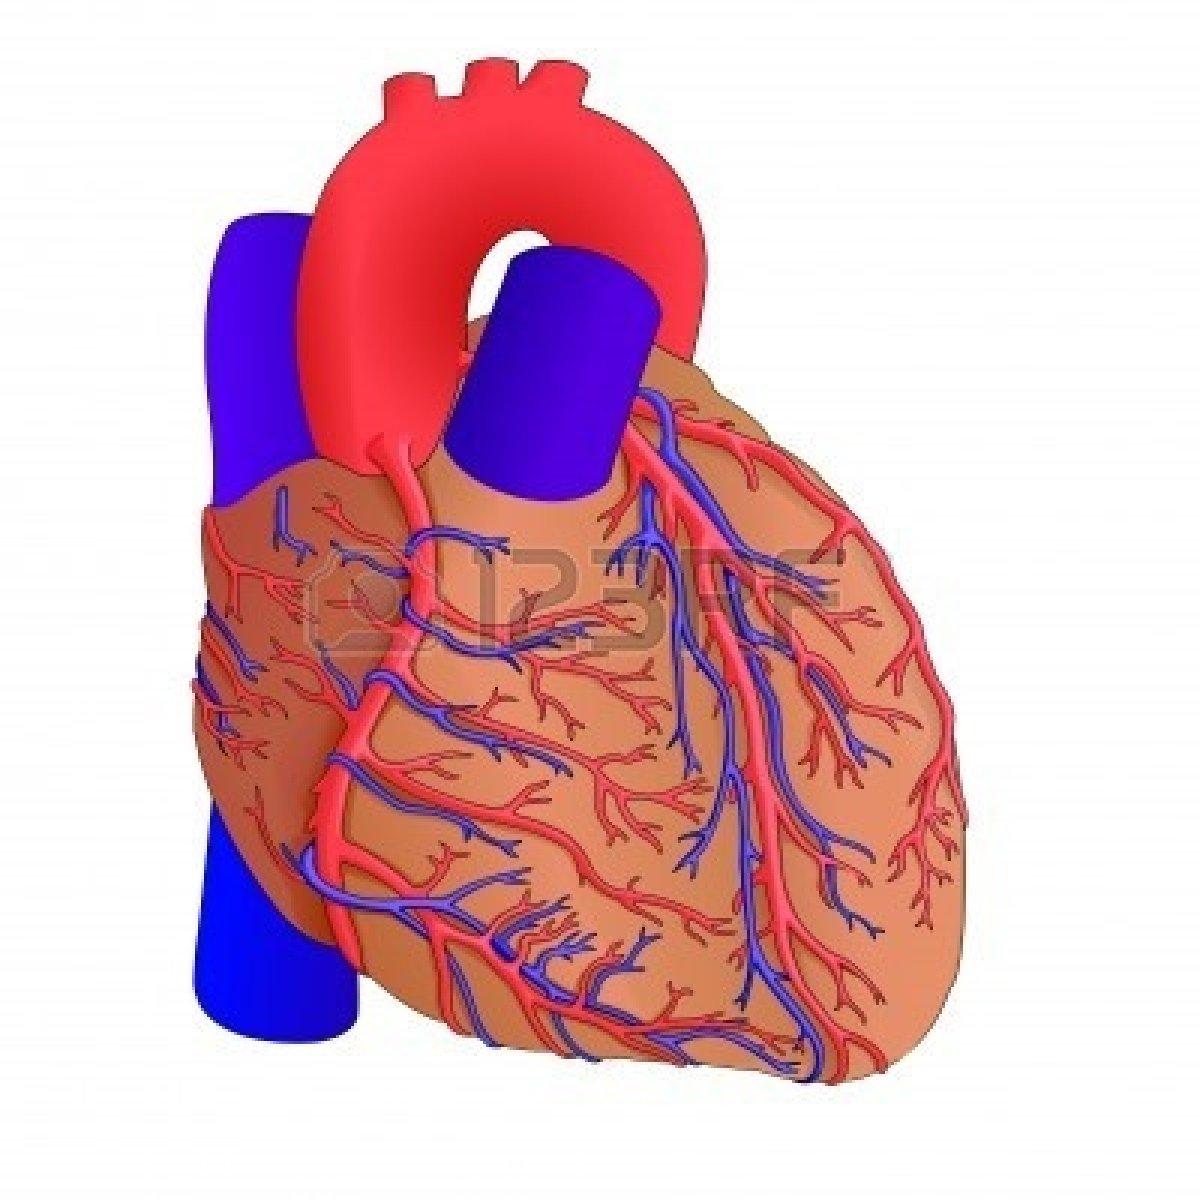 Anatomy clipart anatomical heart  Clipart Anatomy Human Animated